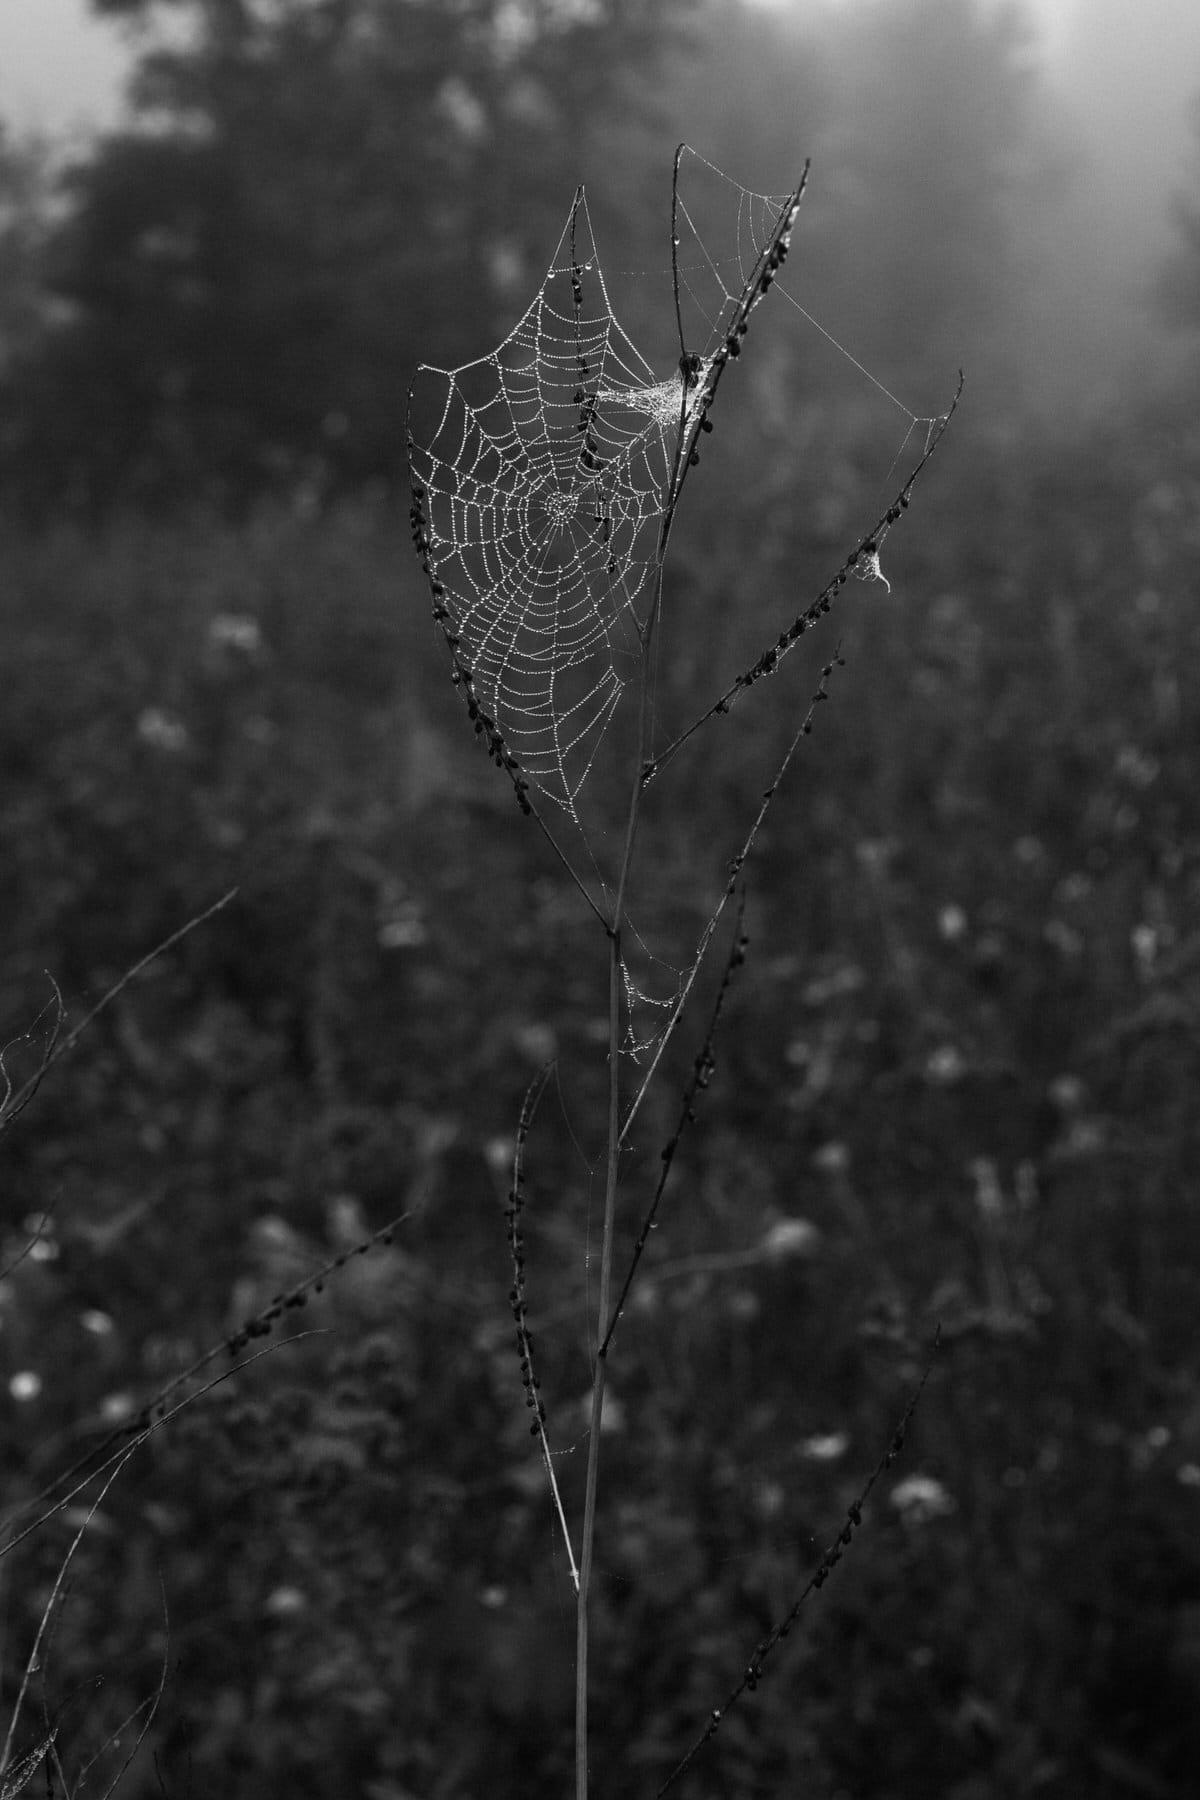 Kiekhaefer-Park-Fond-du-Lac-Wisconsin-black-and-white-fine-art-photography-by-Studio-L-photographer-Laura-Schneider-_3398